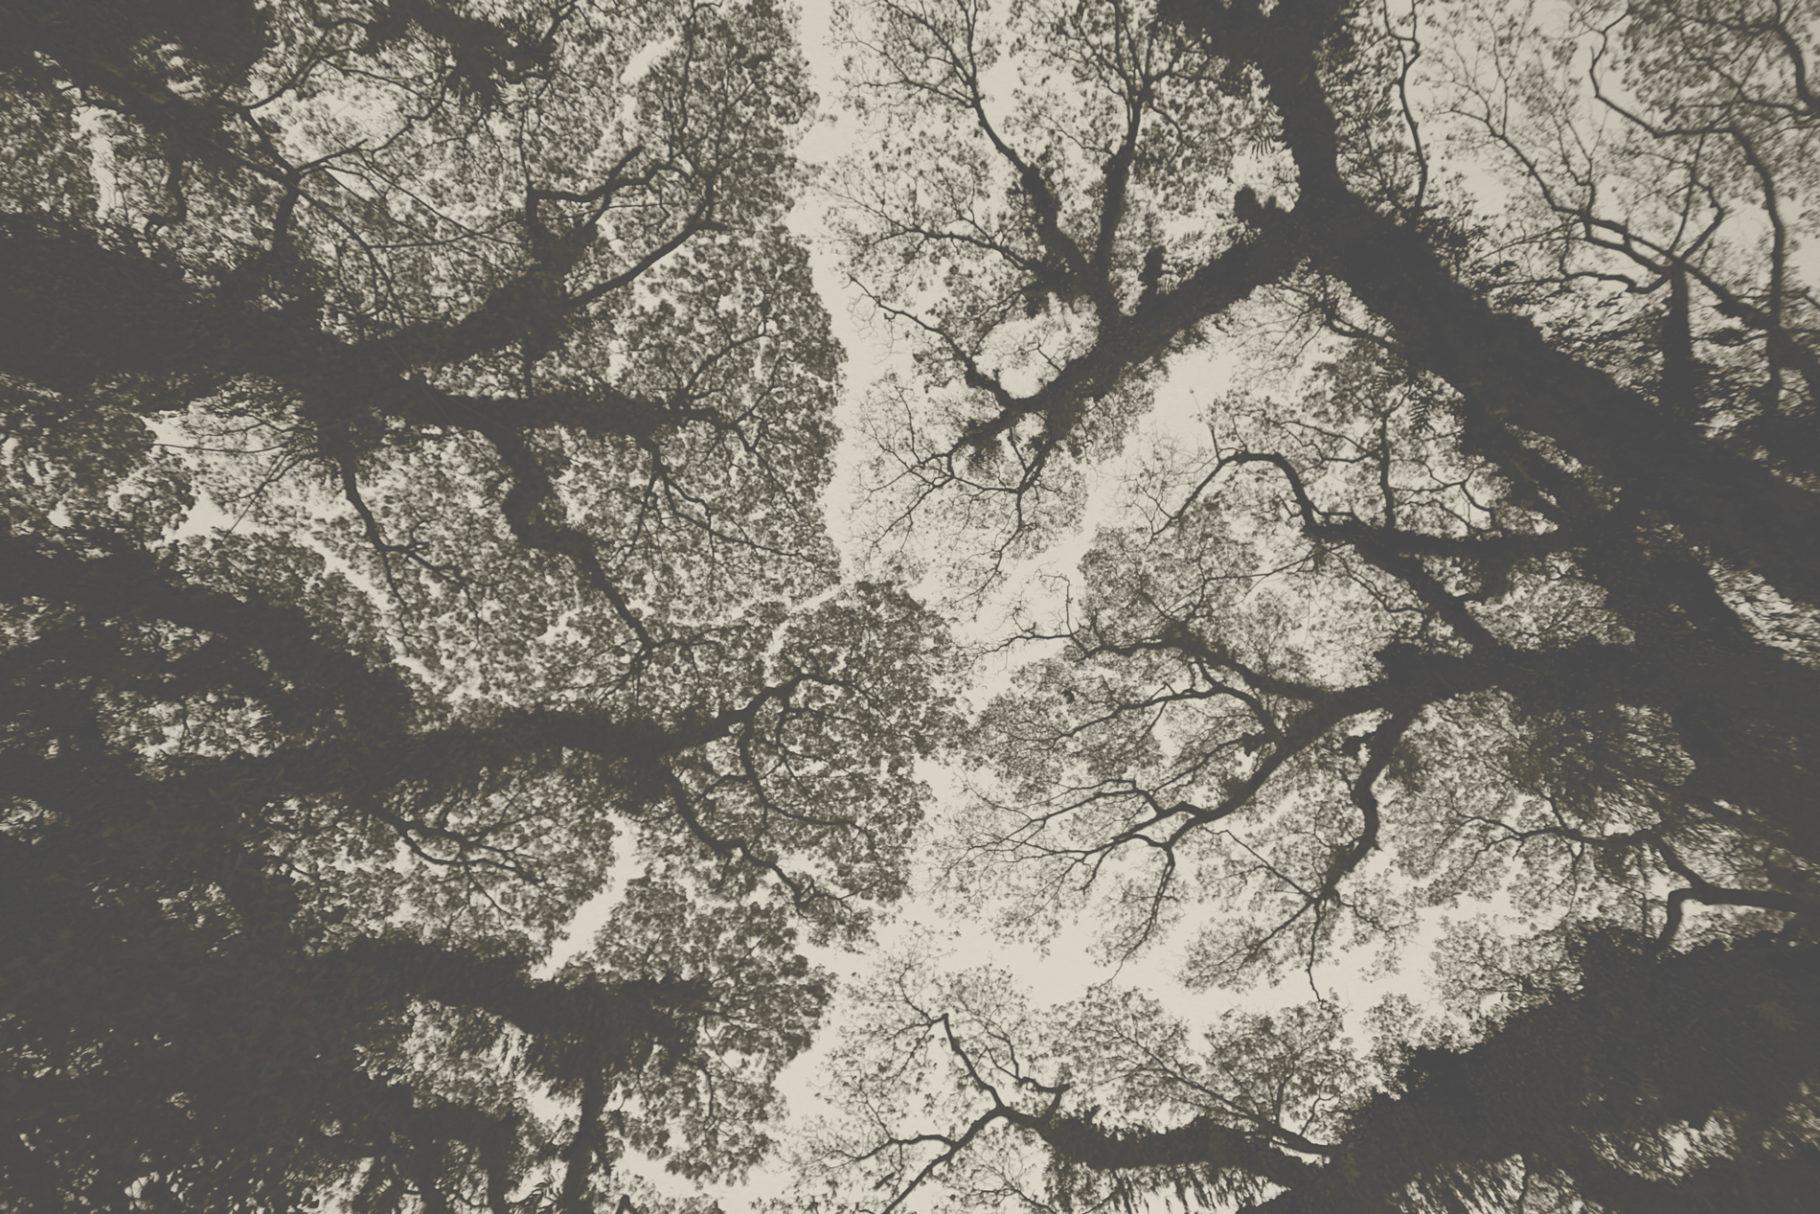 Tree-Territories